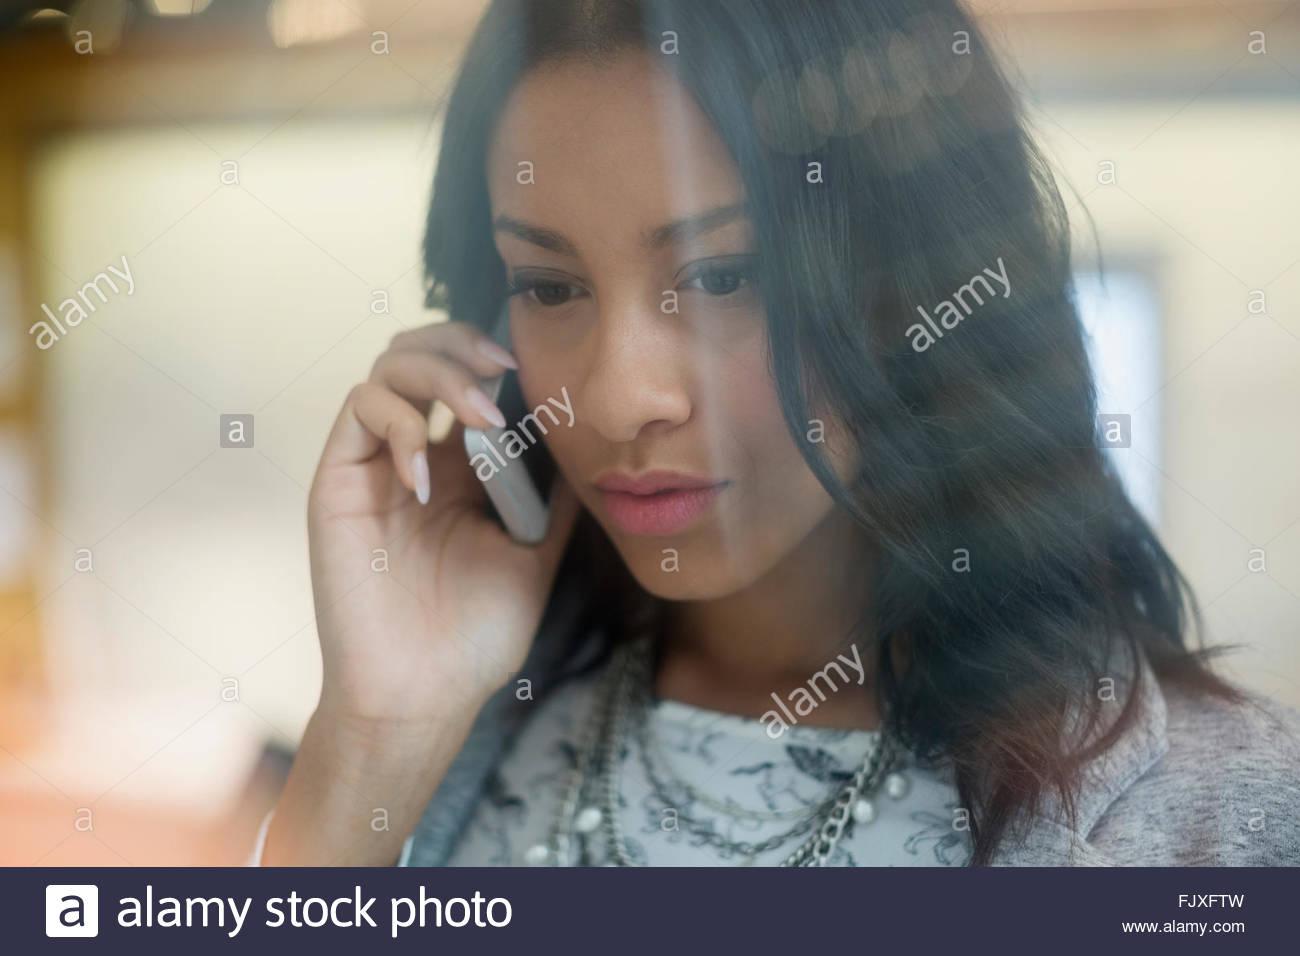 Cerrar grave joven empresaria hablando de teléfono celular Imagen De Stock